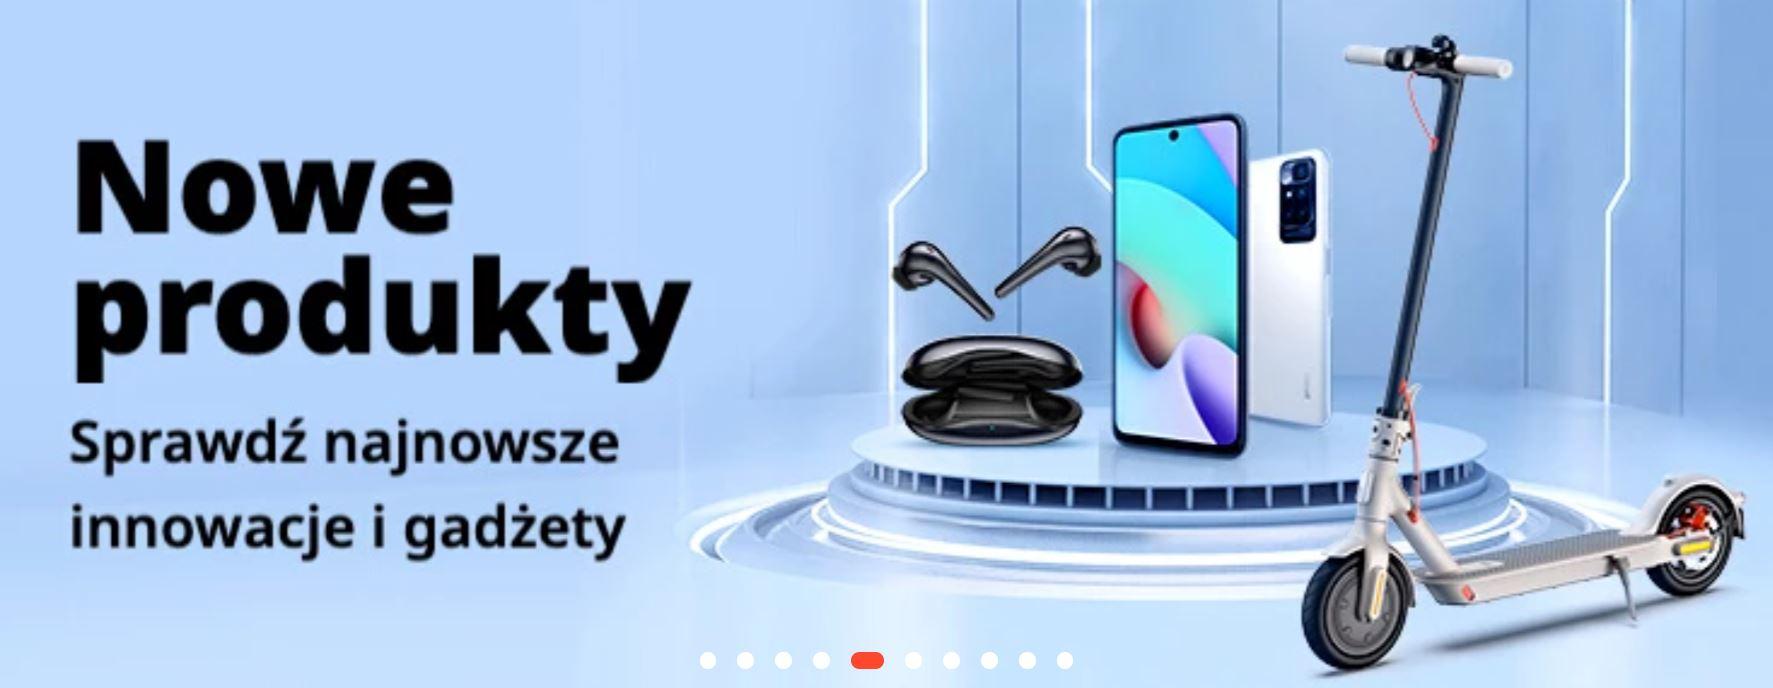 Promocja Aliexpress - nowe produkty